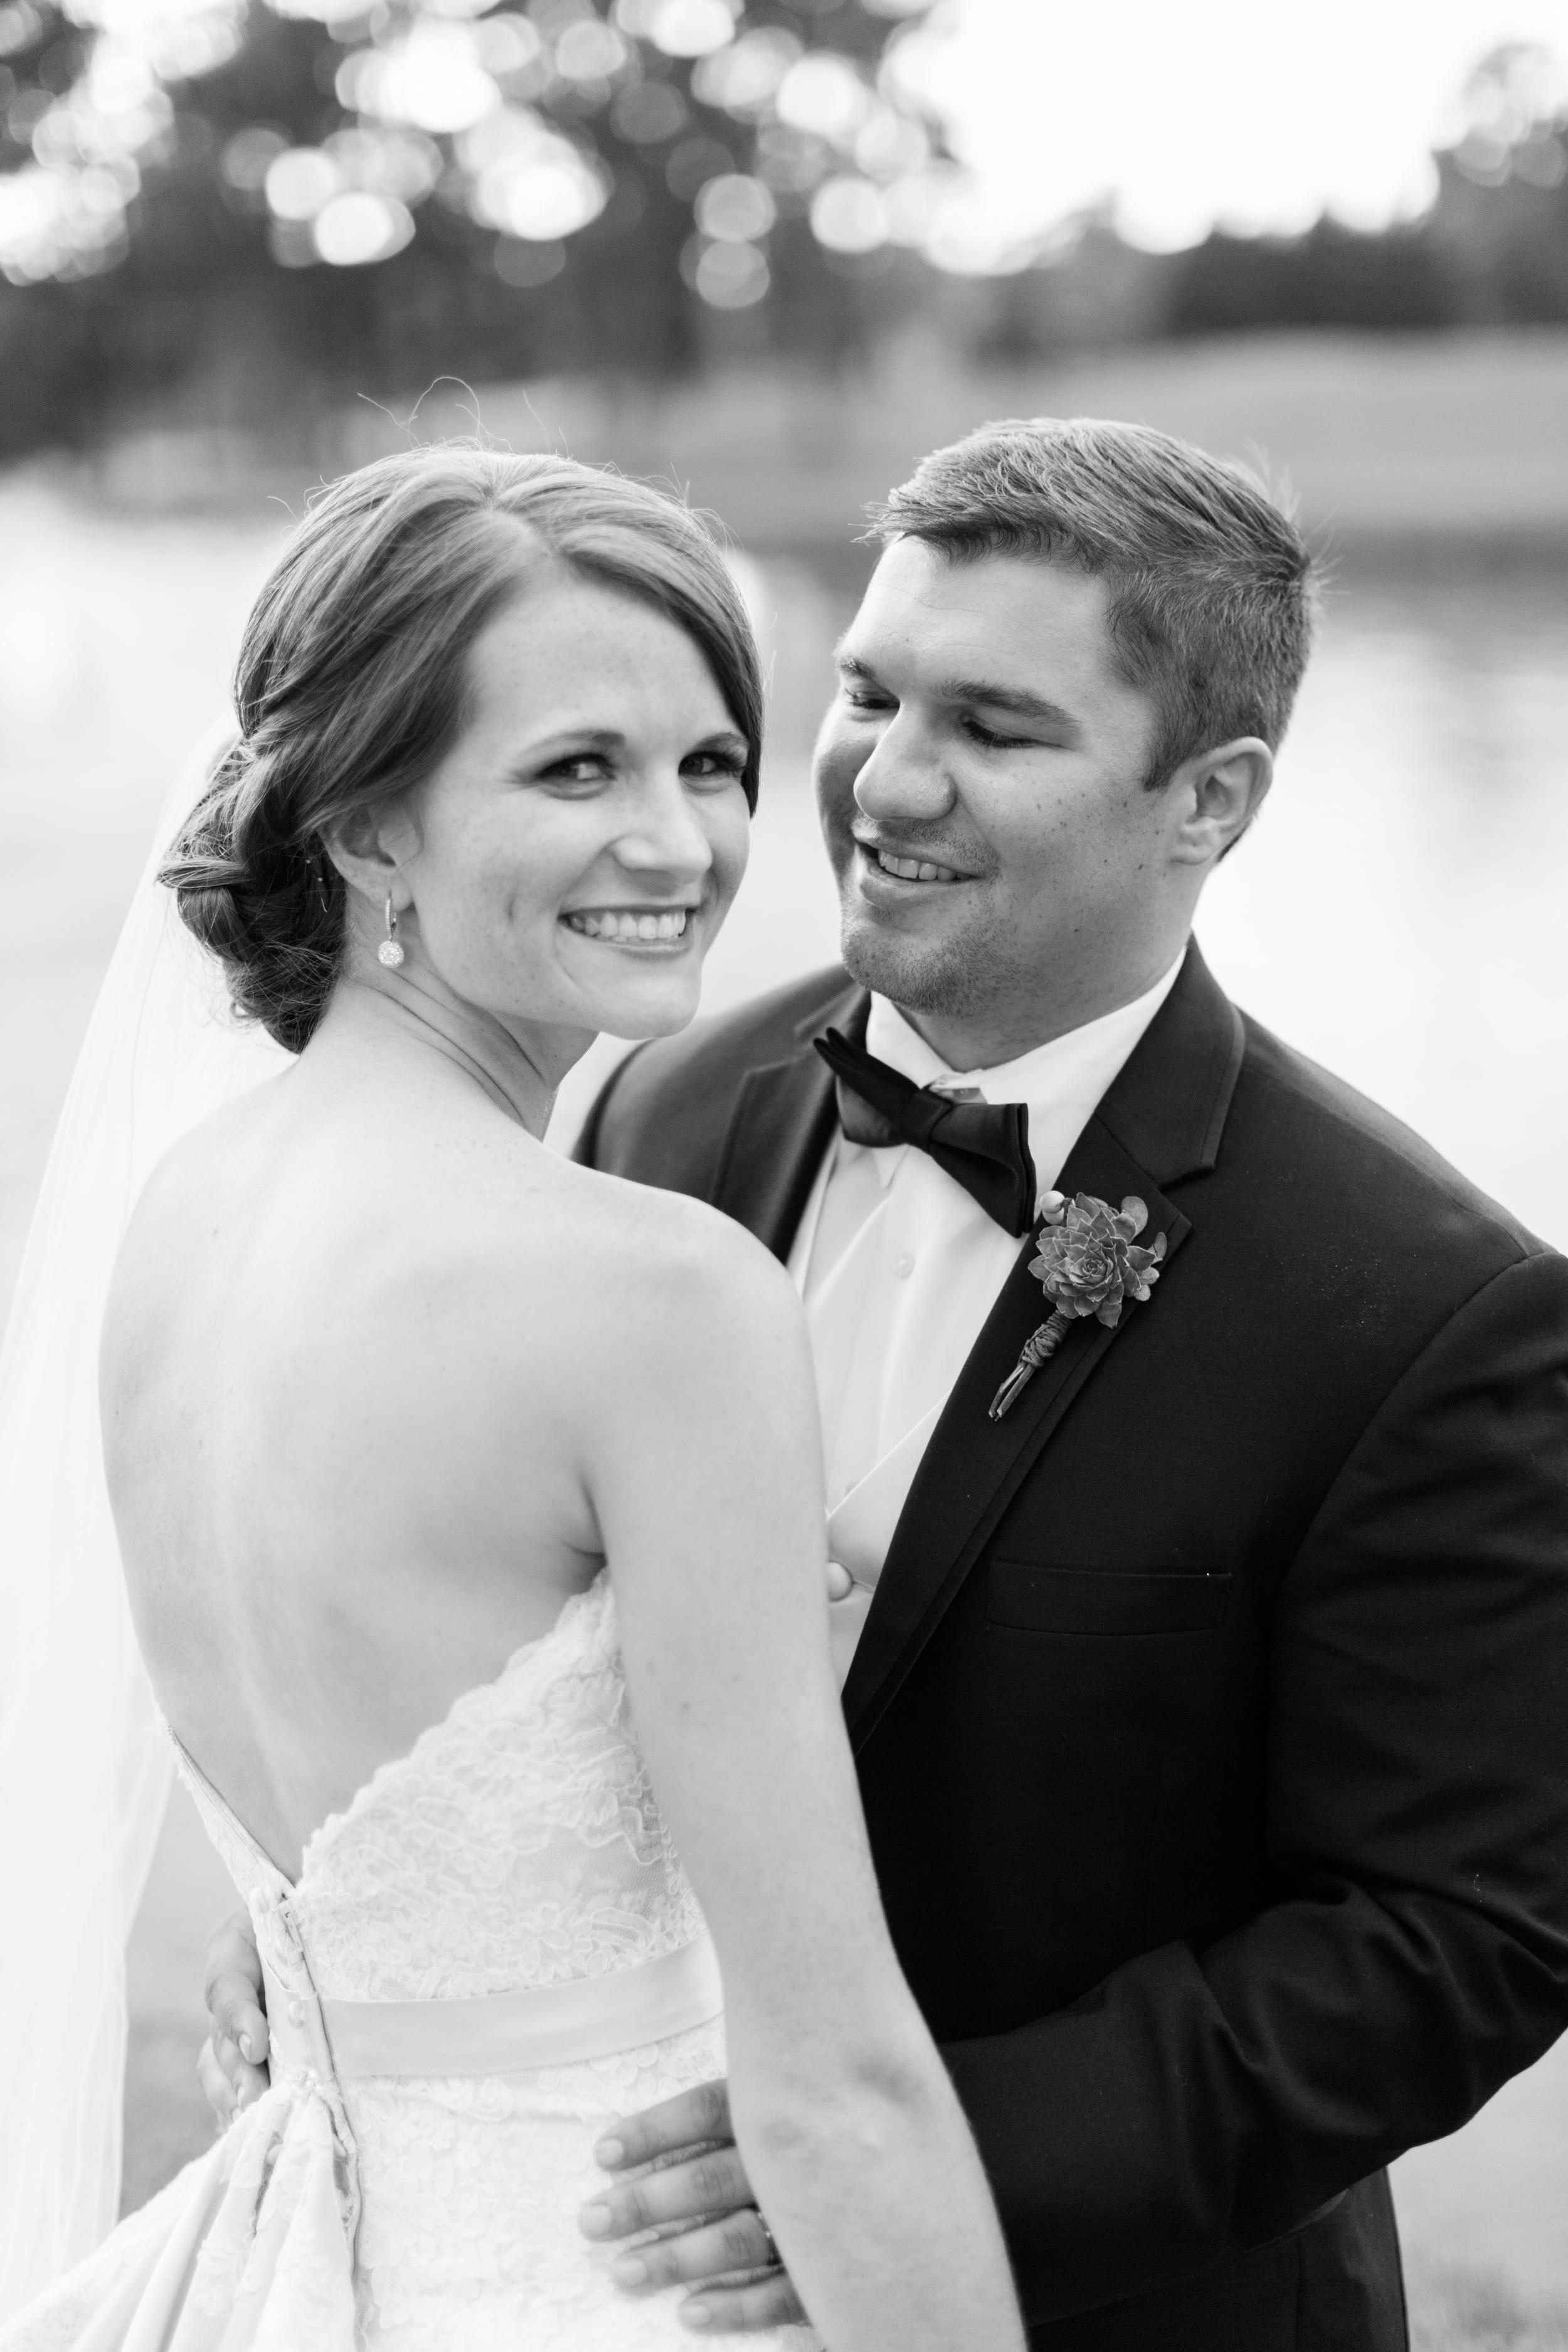 Brewbaker-Wedding-Montgomery-Alabama-Nick-Drollette-120.jpg